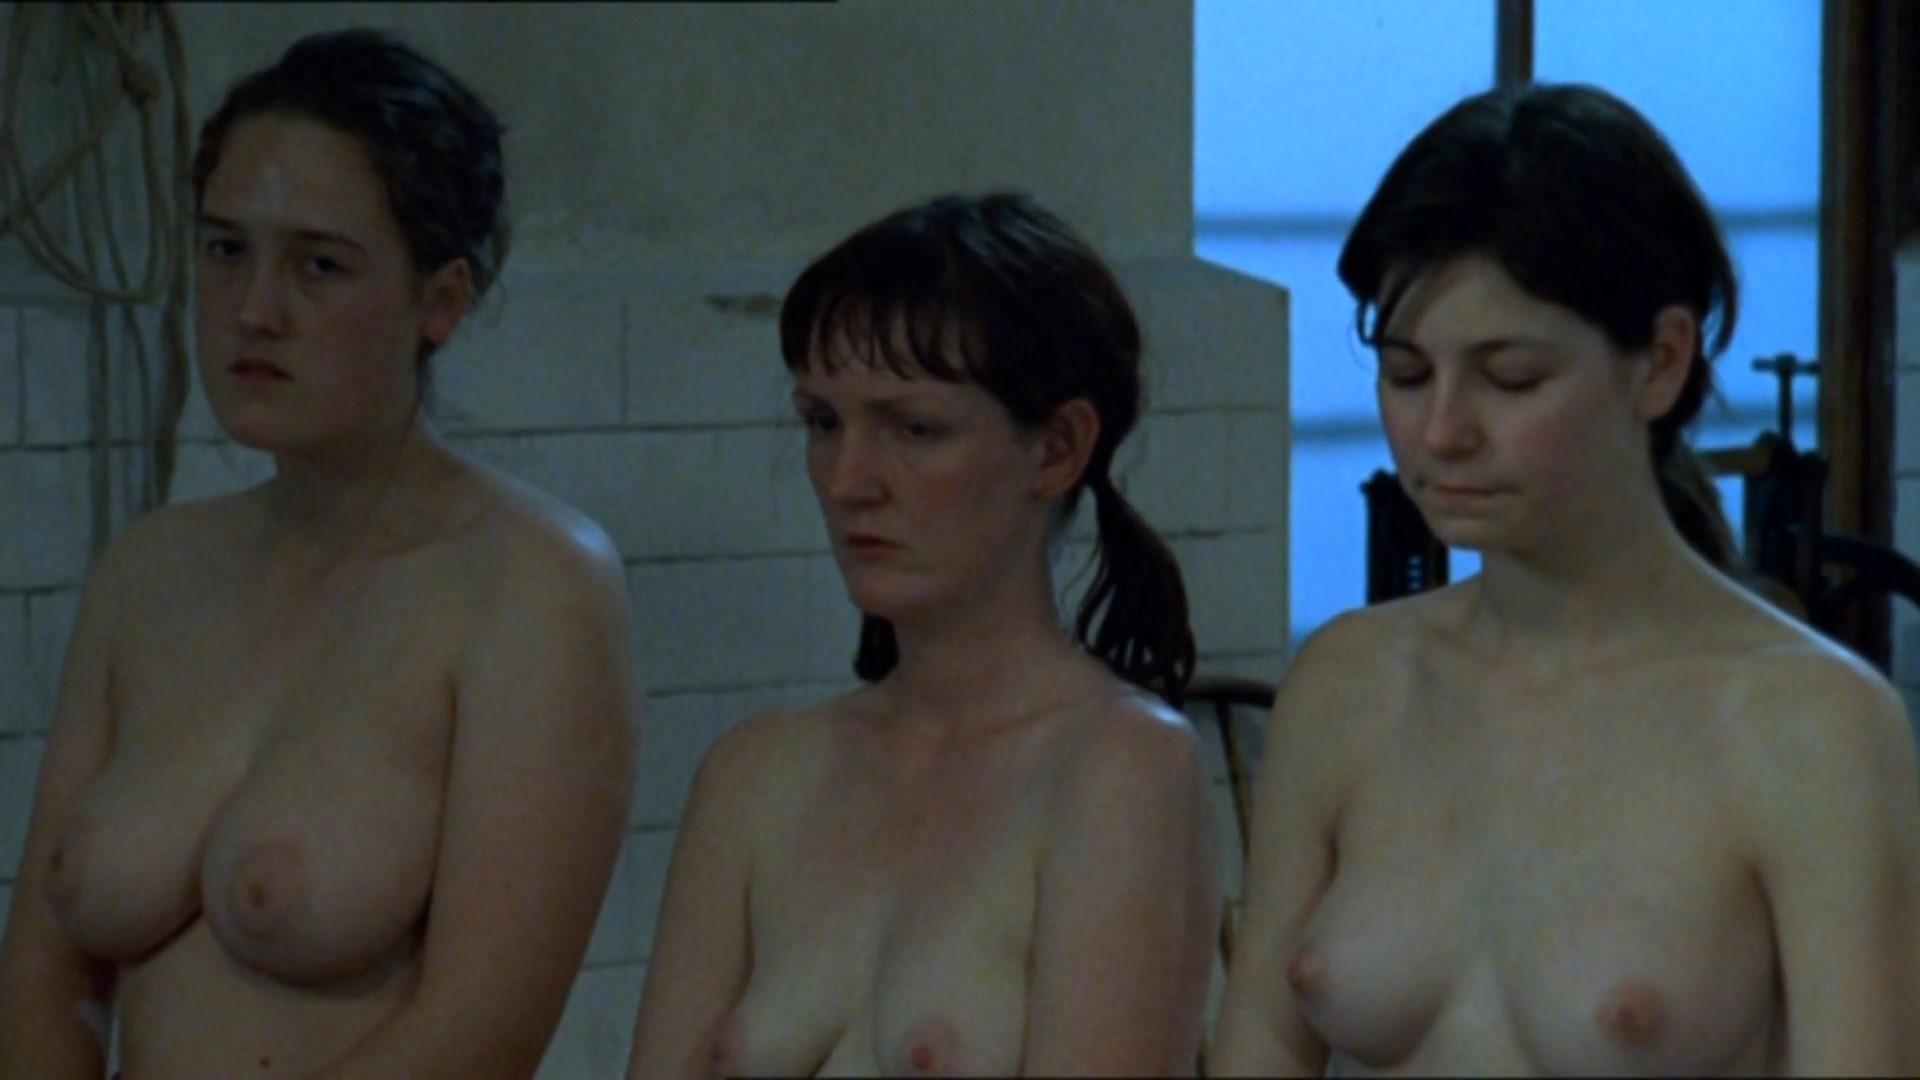 nora jane noon naked